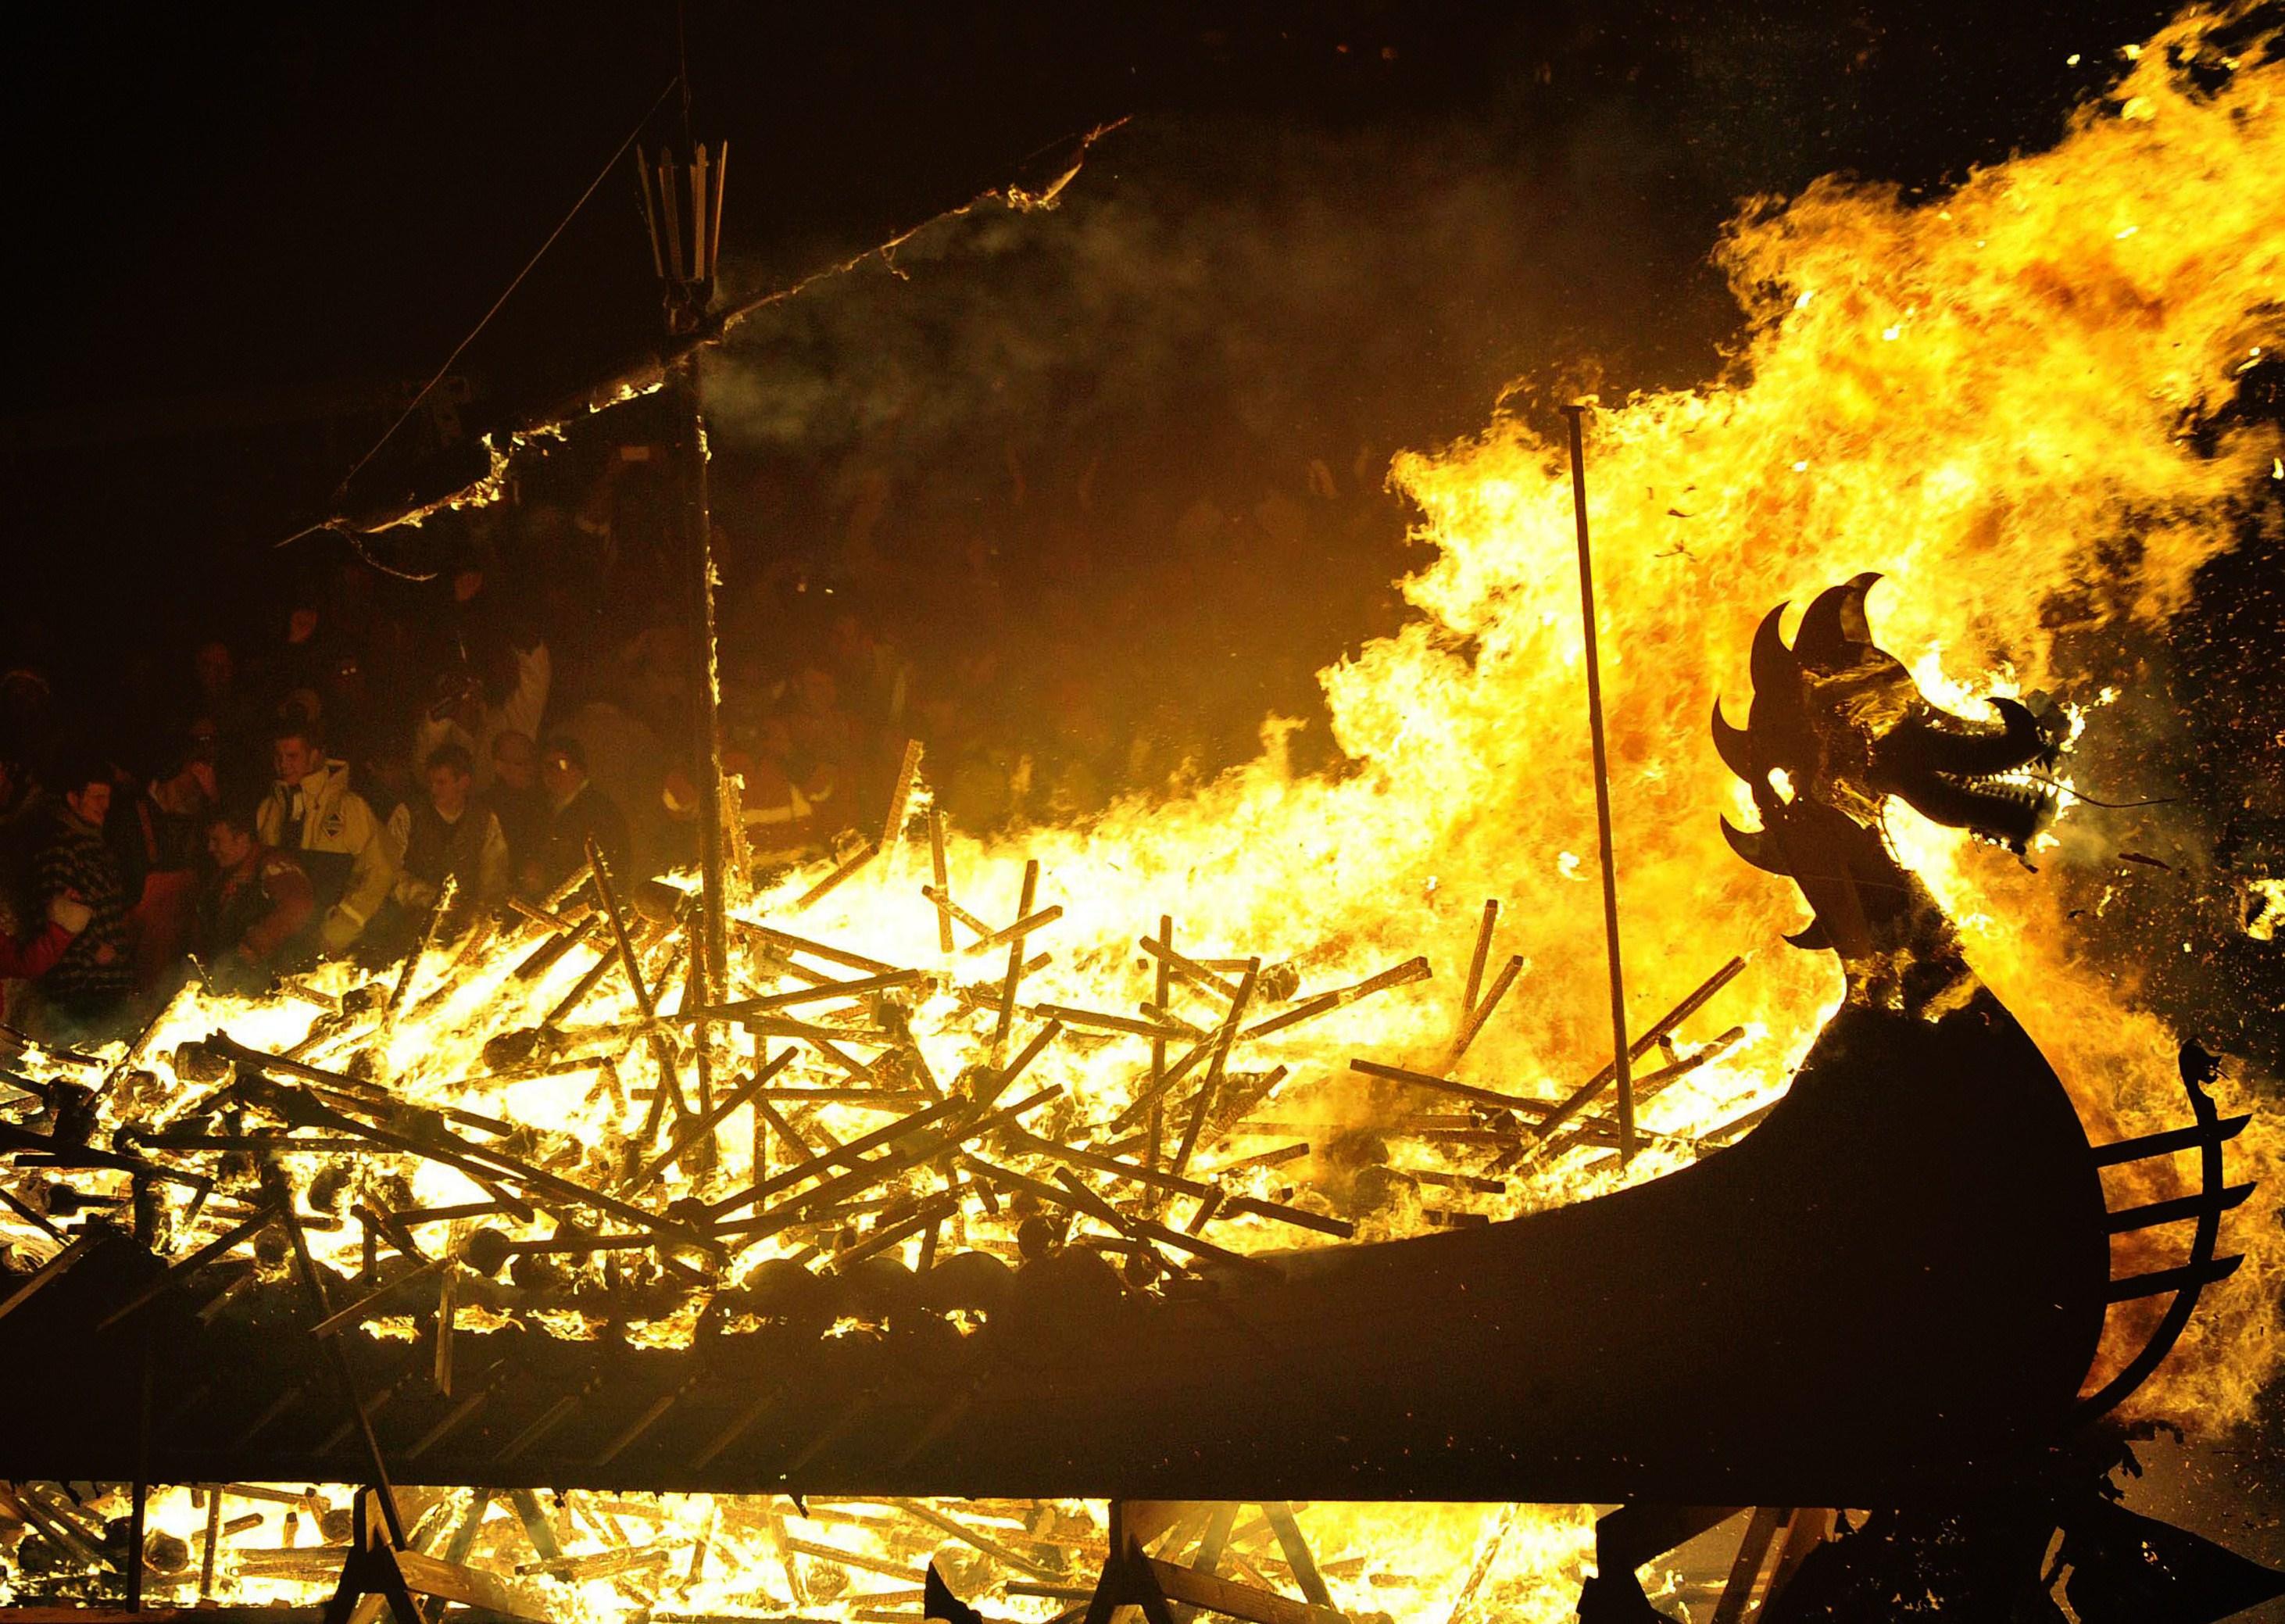 Gallery: Up Helly AA Fire Festival on Shetland